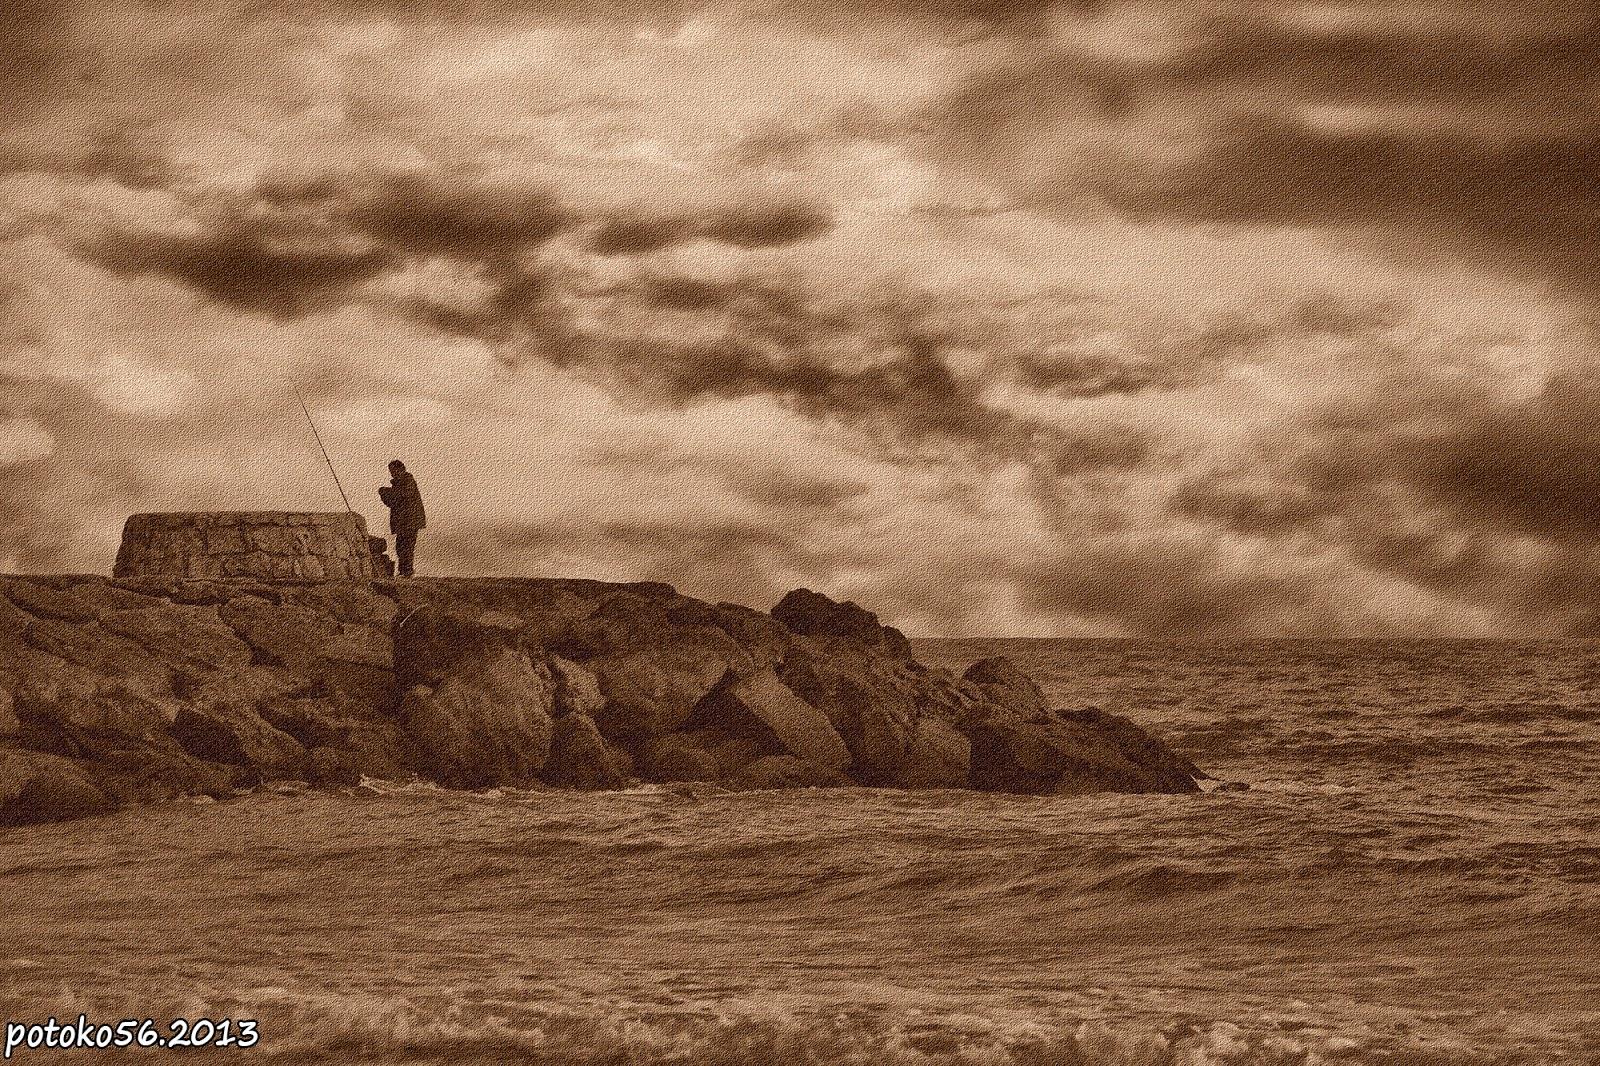 Pescador en el espigon preparando anzuelo